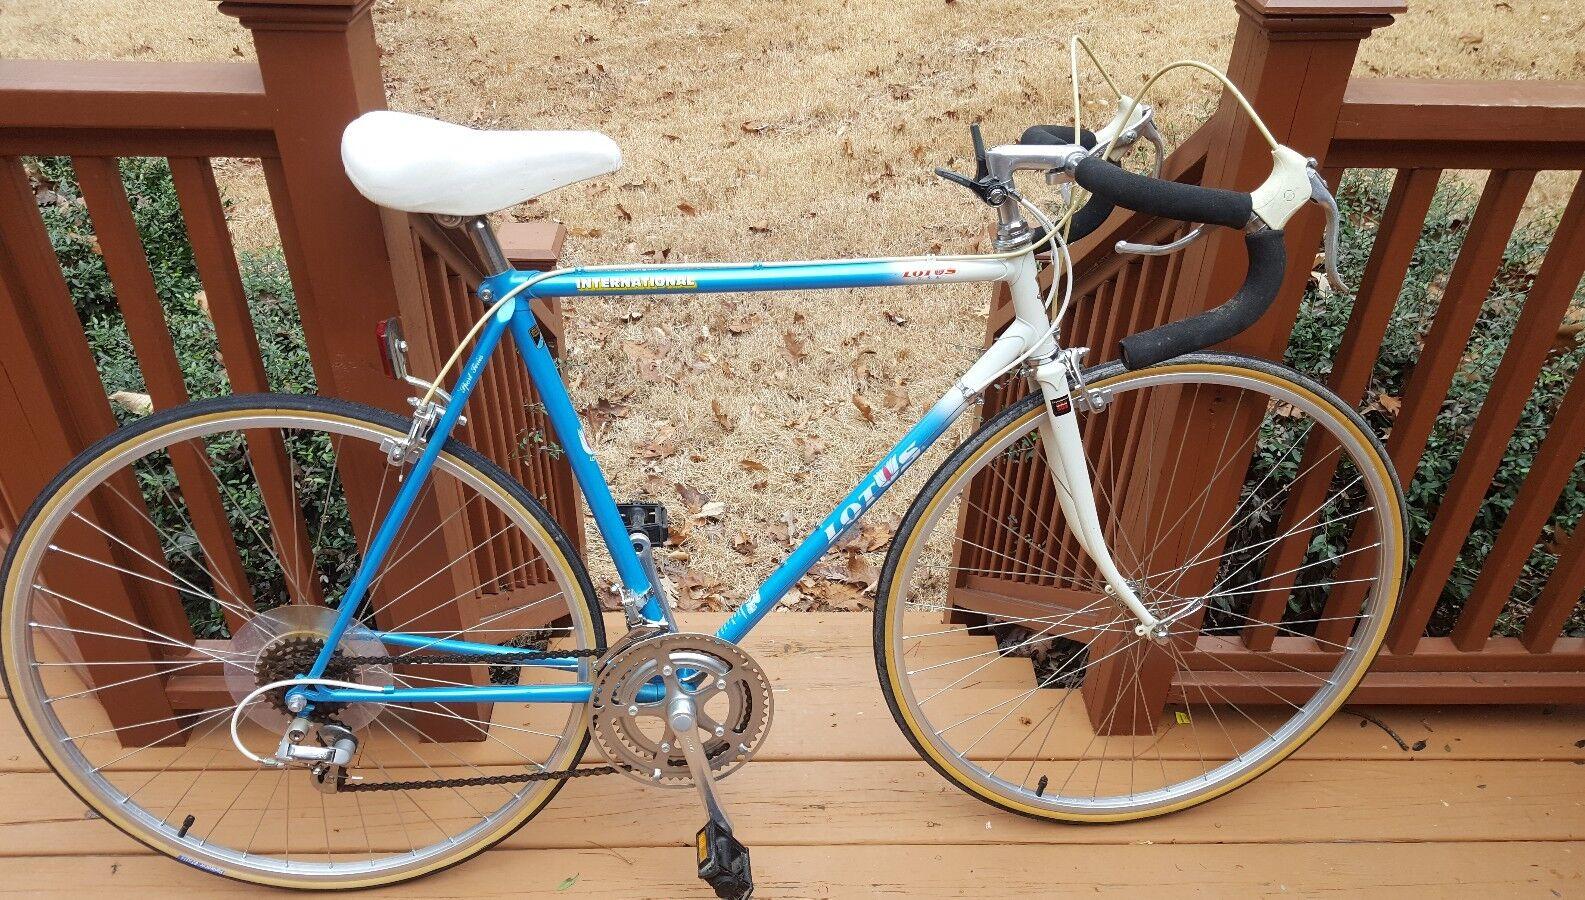 Mint Original 1988 Lotus International Sport Series Bicycle Made In Japan